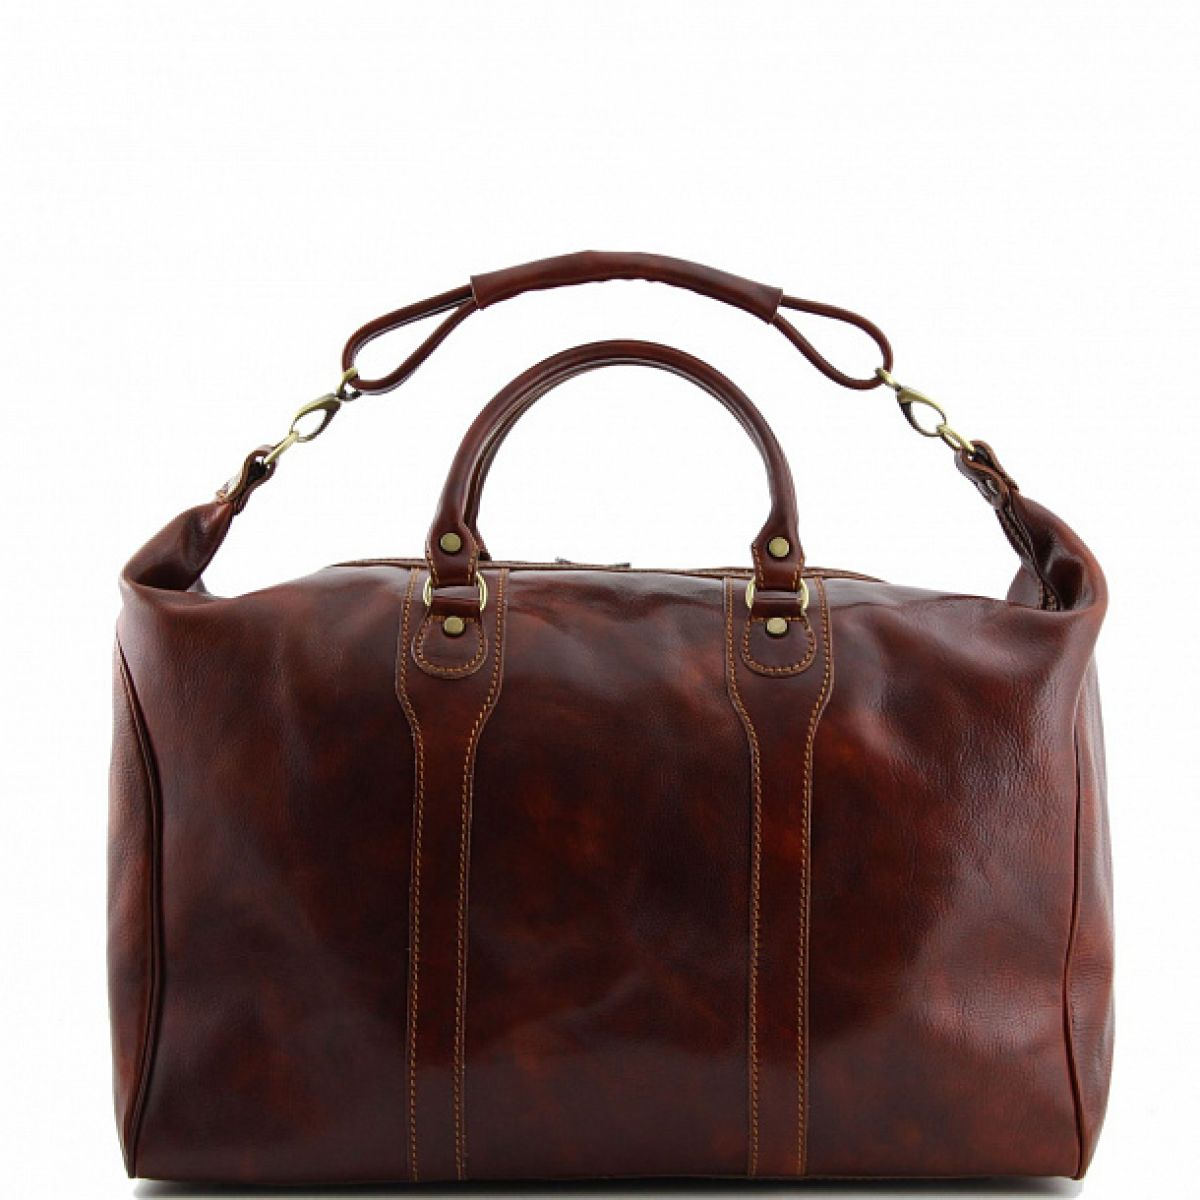 tuscany leather сумки купить